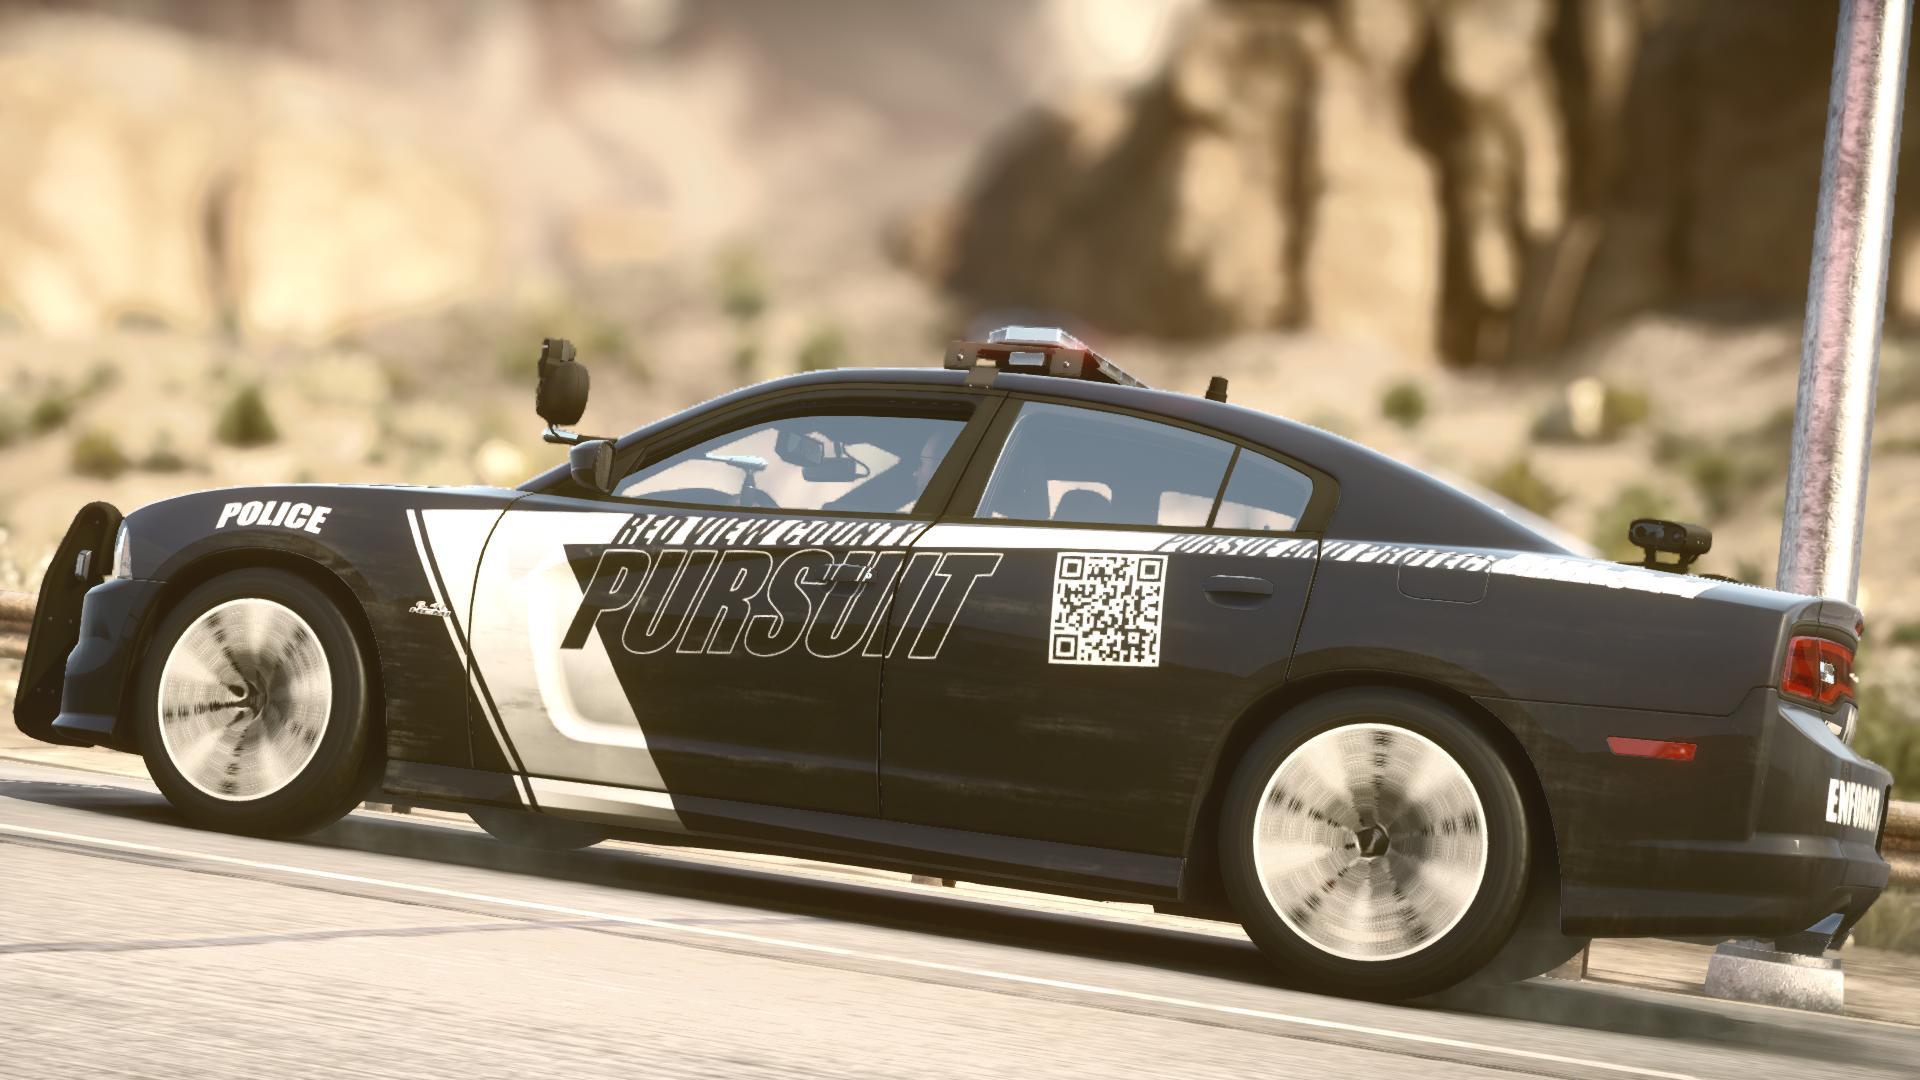 Mitsubishi Evo Ix Rcpd Enforcer Unit Nfs Rivals Gta5